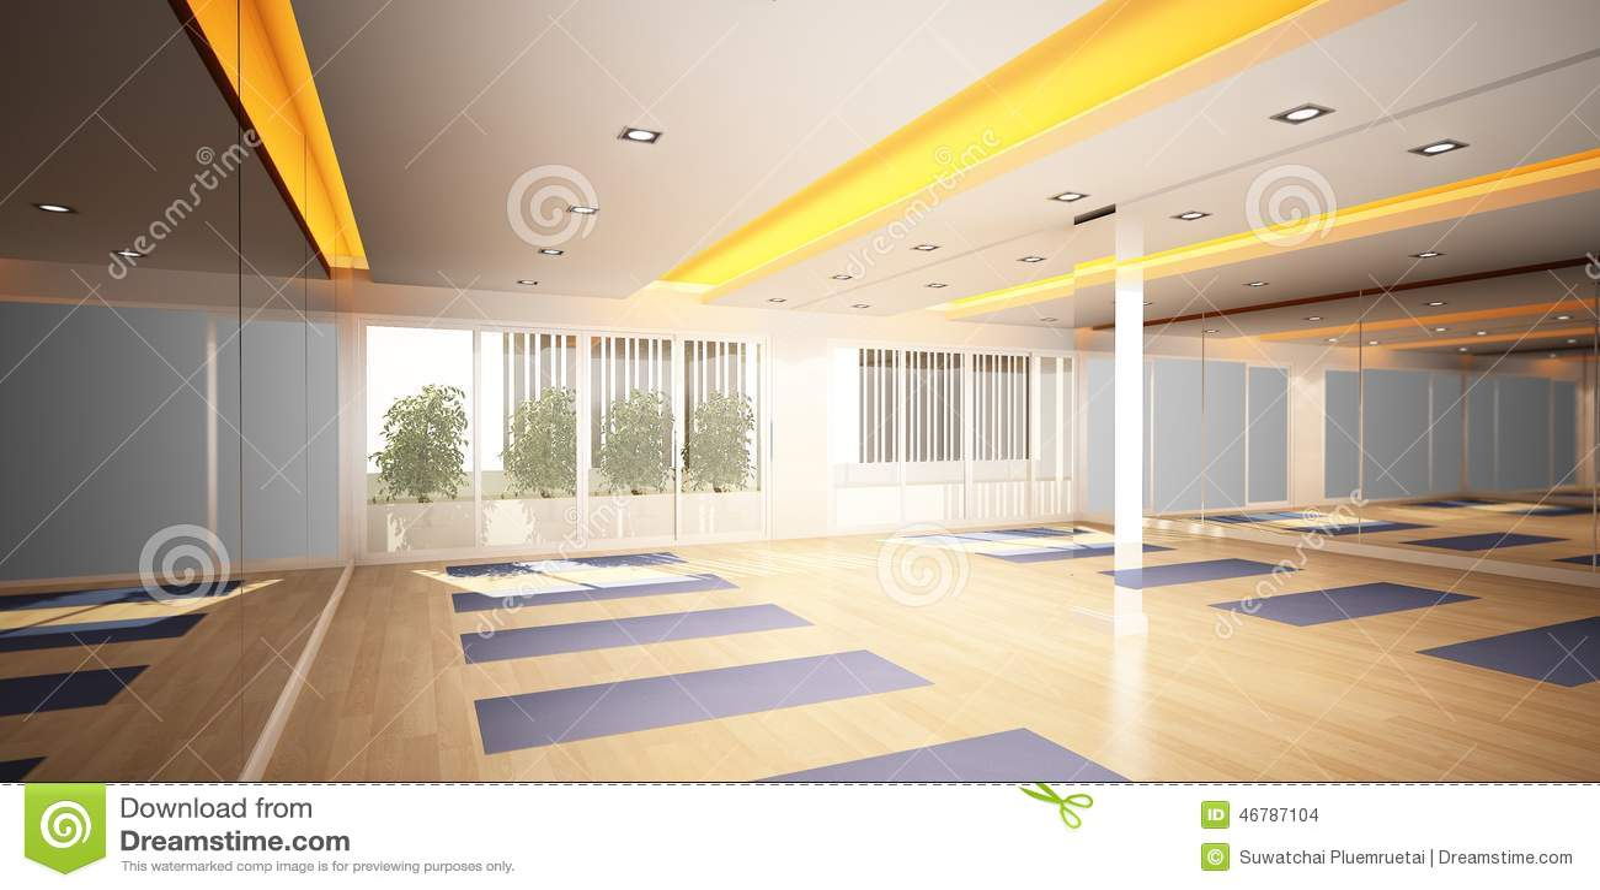 Yoga Room 3d Interior Design Stock Illustration Image 46787104